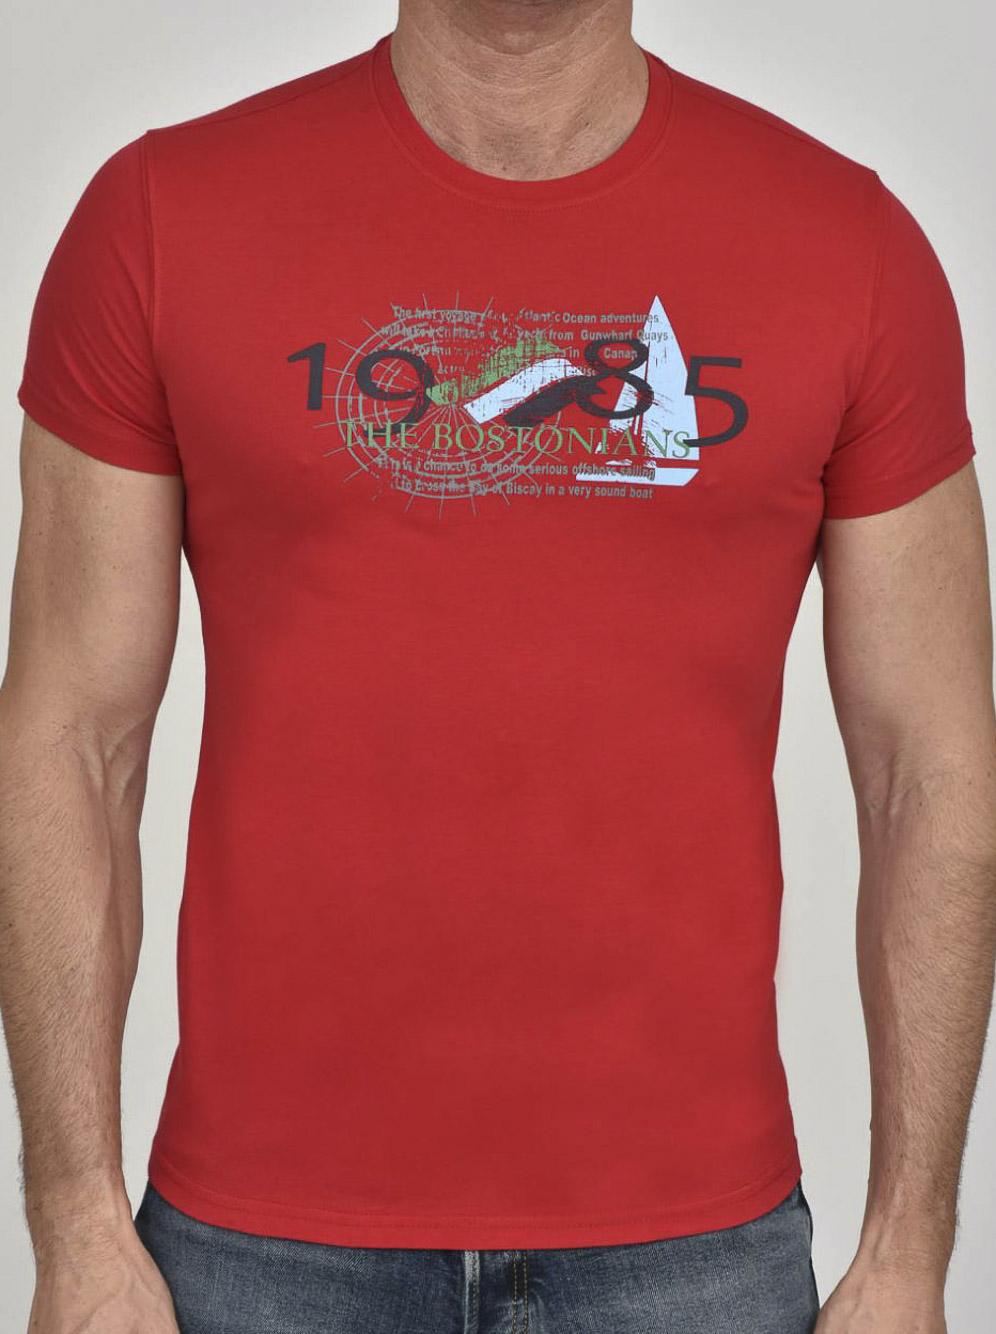 THE BOSTONIANS Μπλούζα T-Shirt 3TS00100-B00240 ΚΟΚΚΙΝΟ